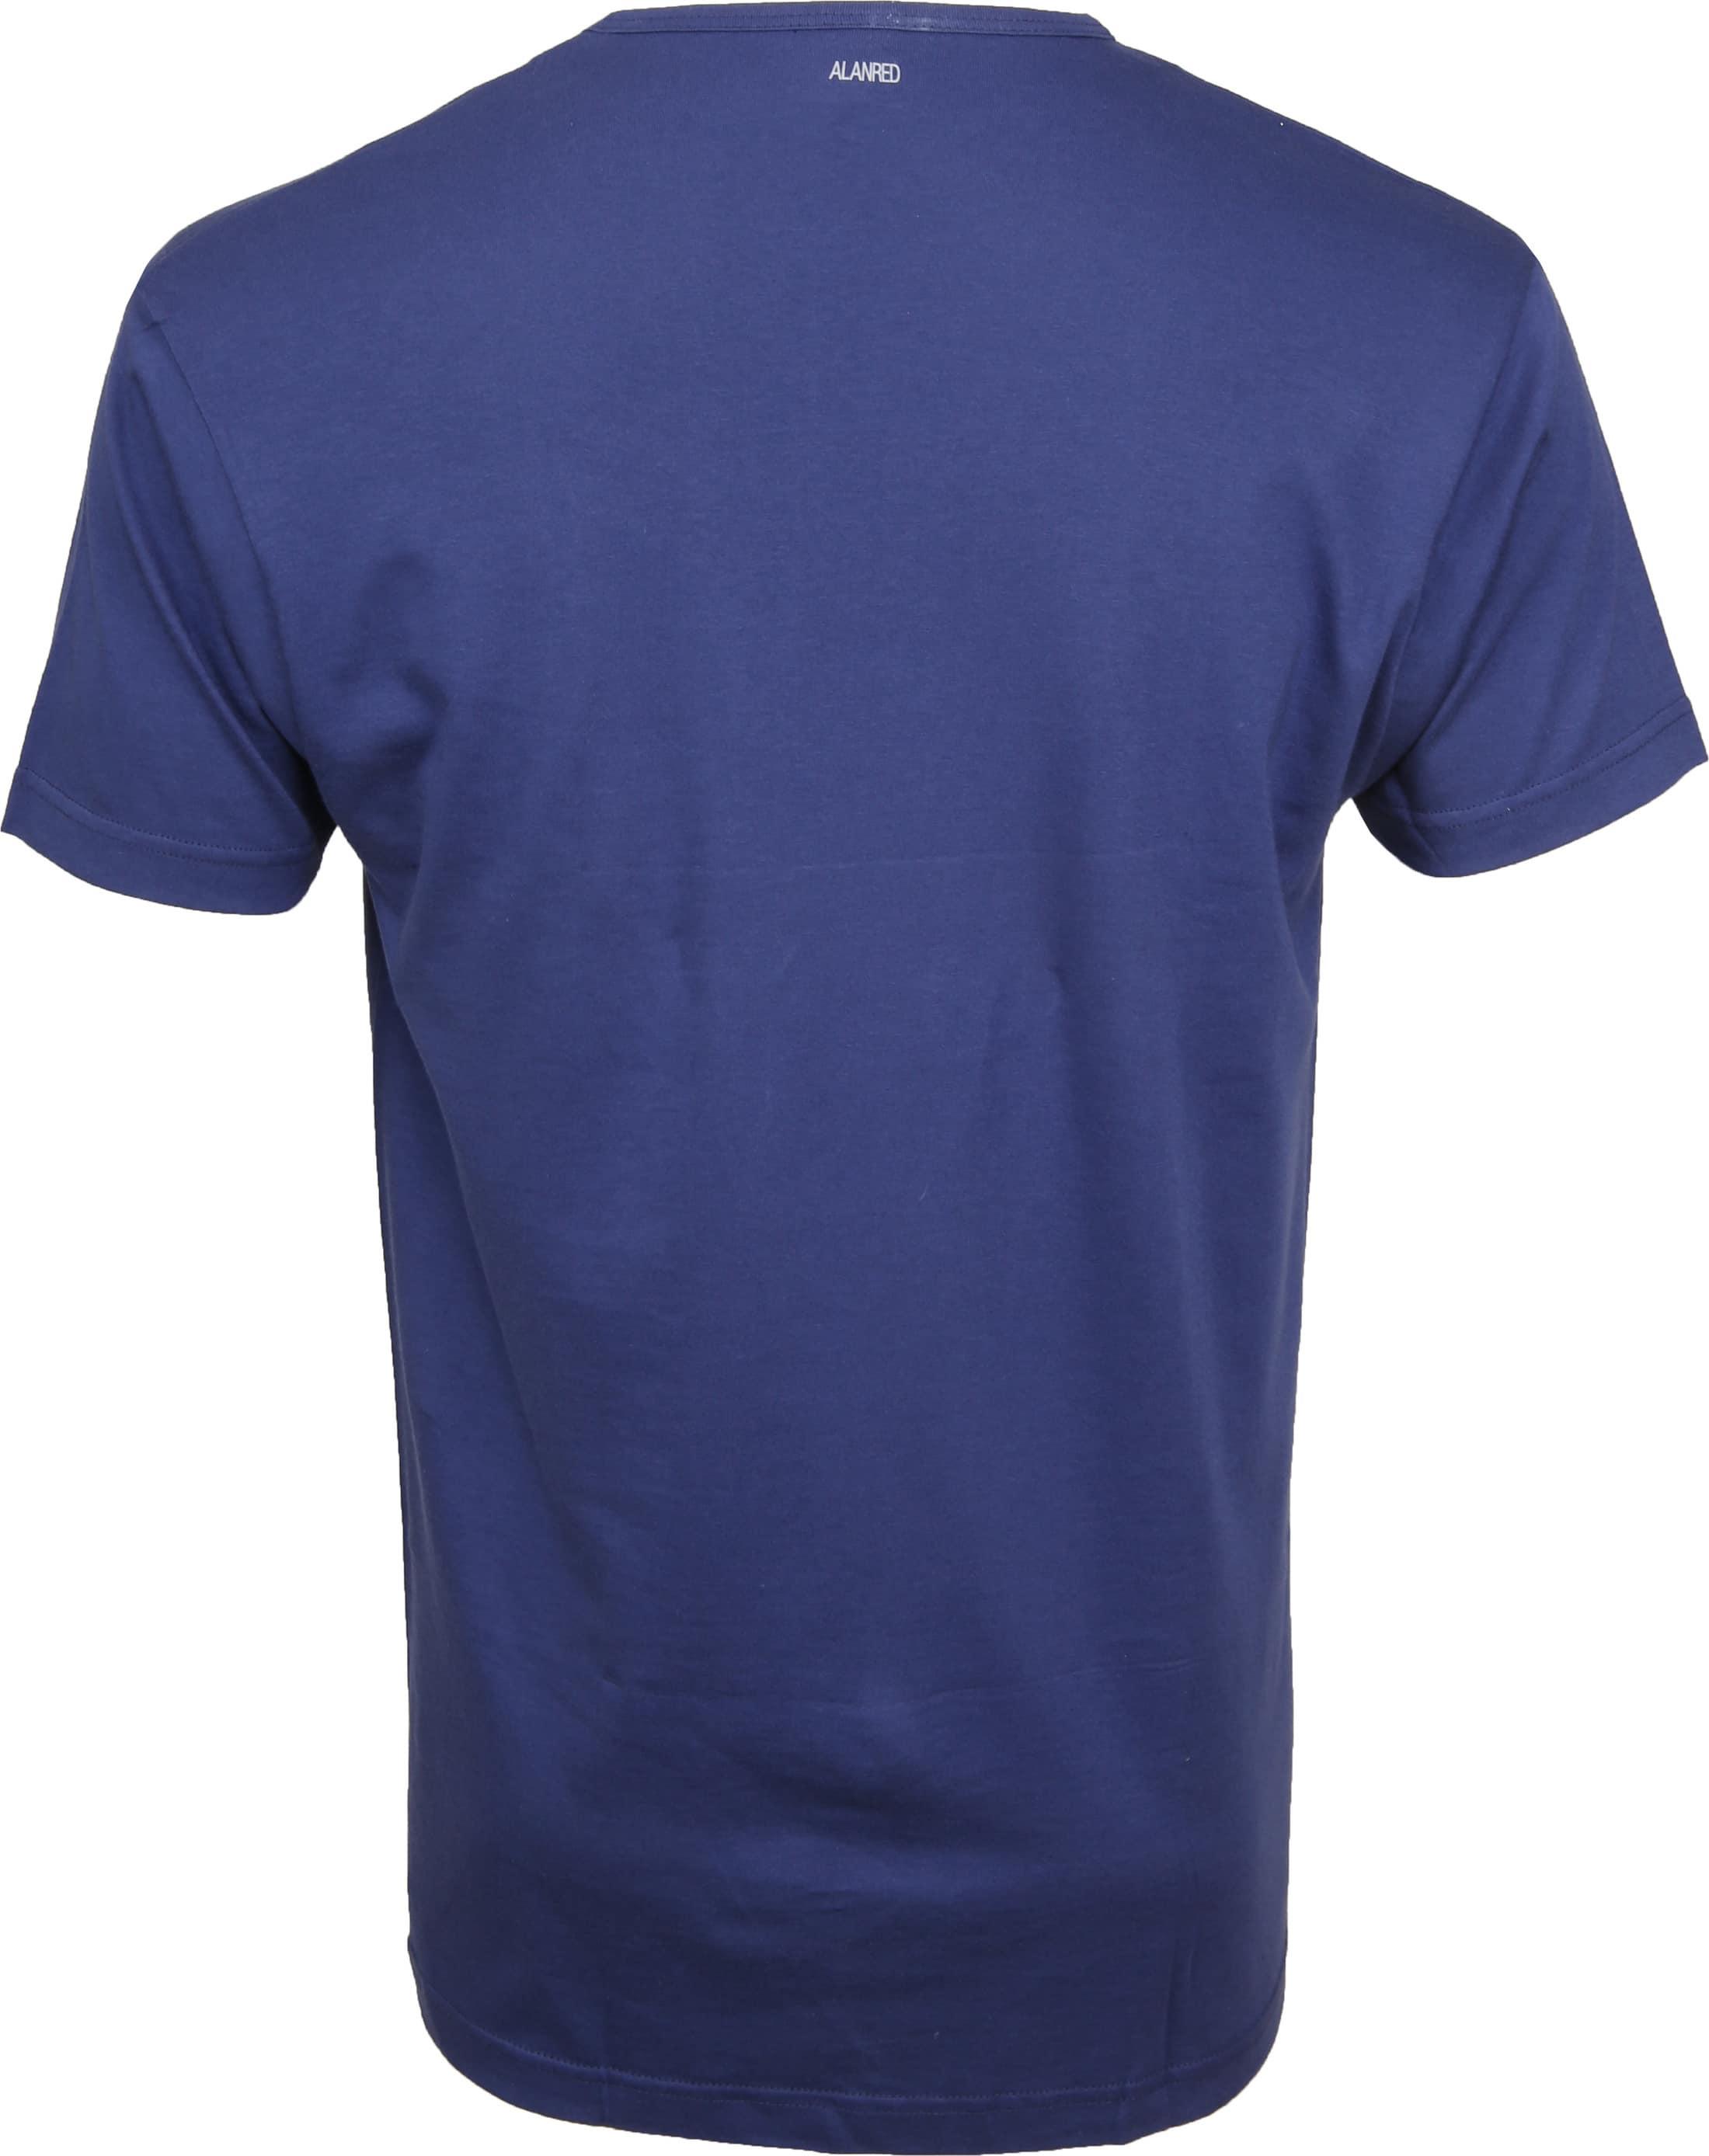 Alan Red Vermont T-shirts V-Hals Blauw (2Pack) foto 4